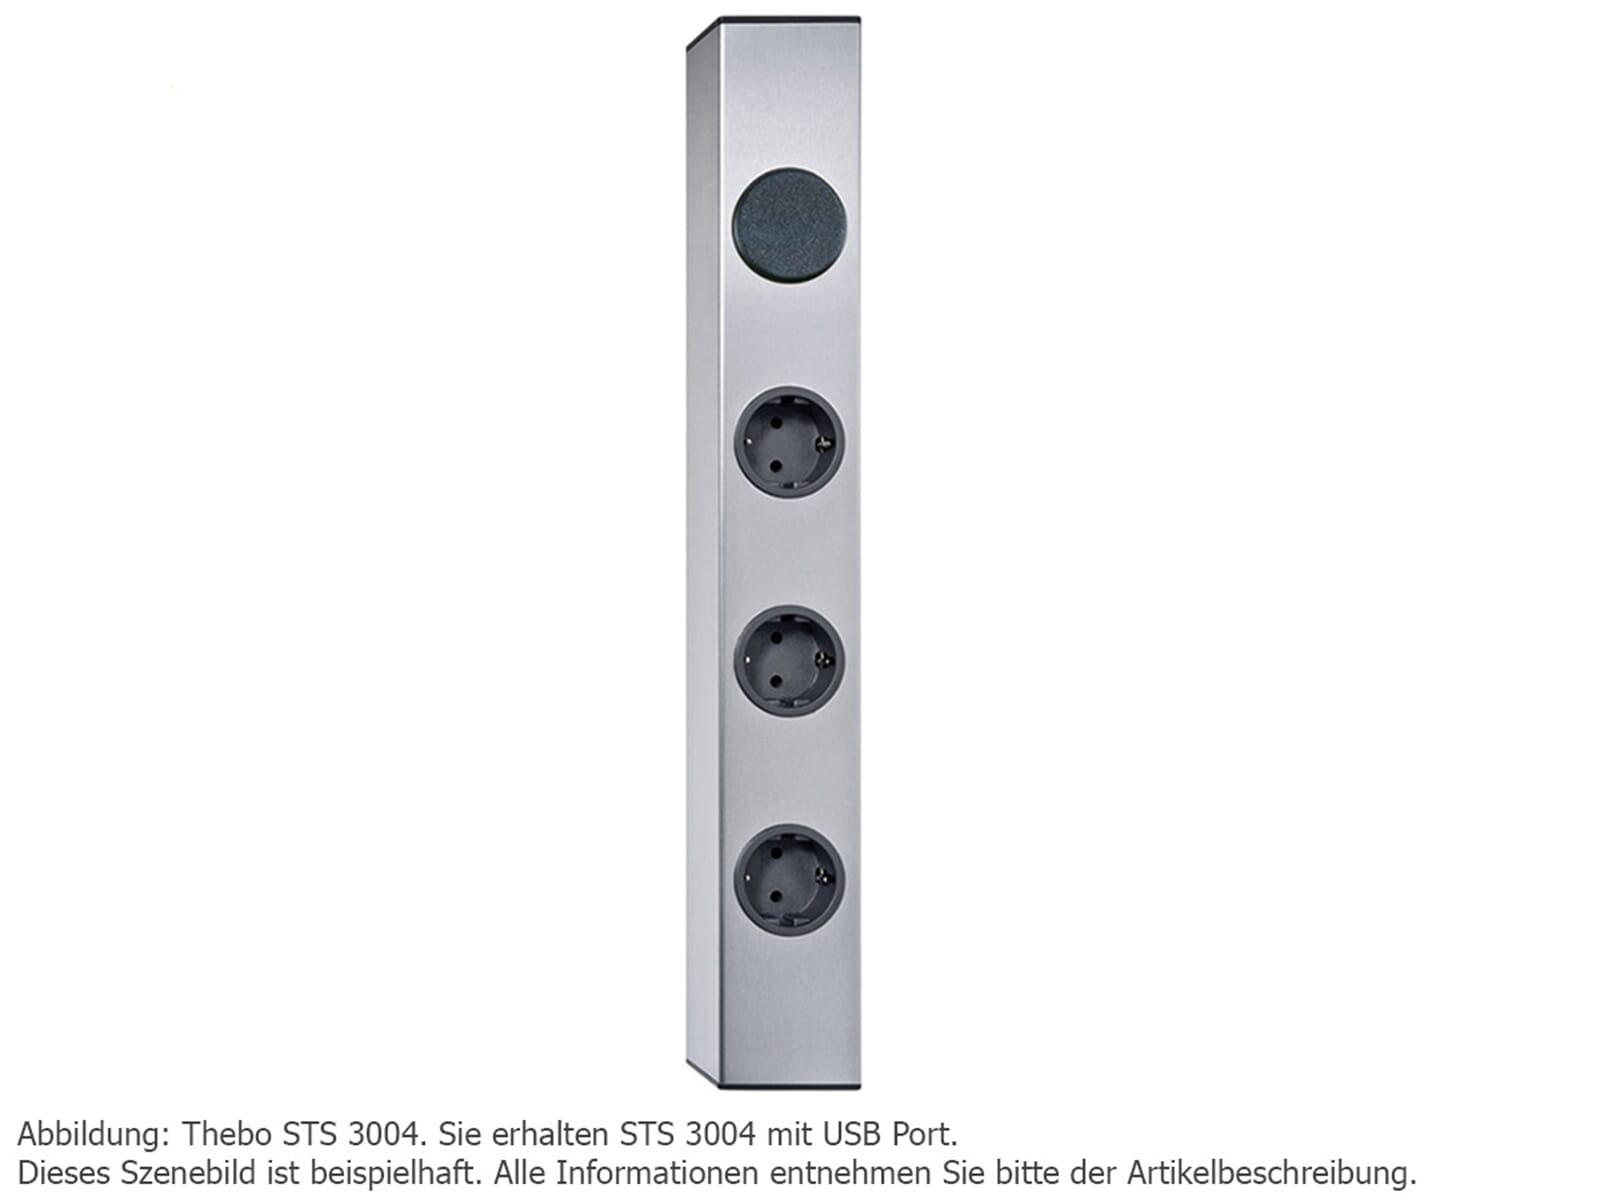 Thebo STS 3004 + USB Port - 1749406 Steckdosenelement Edelstahl